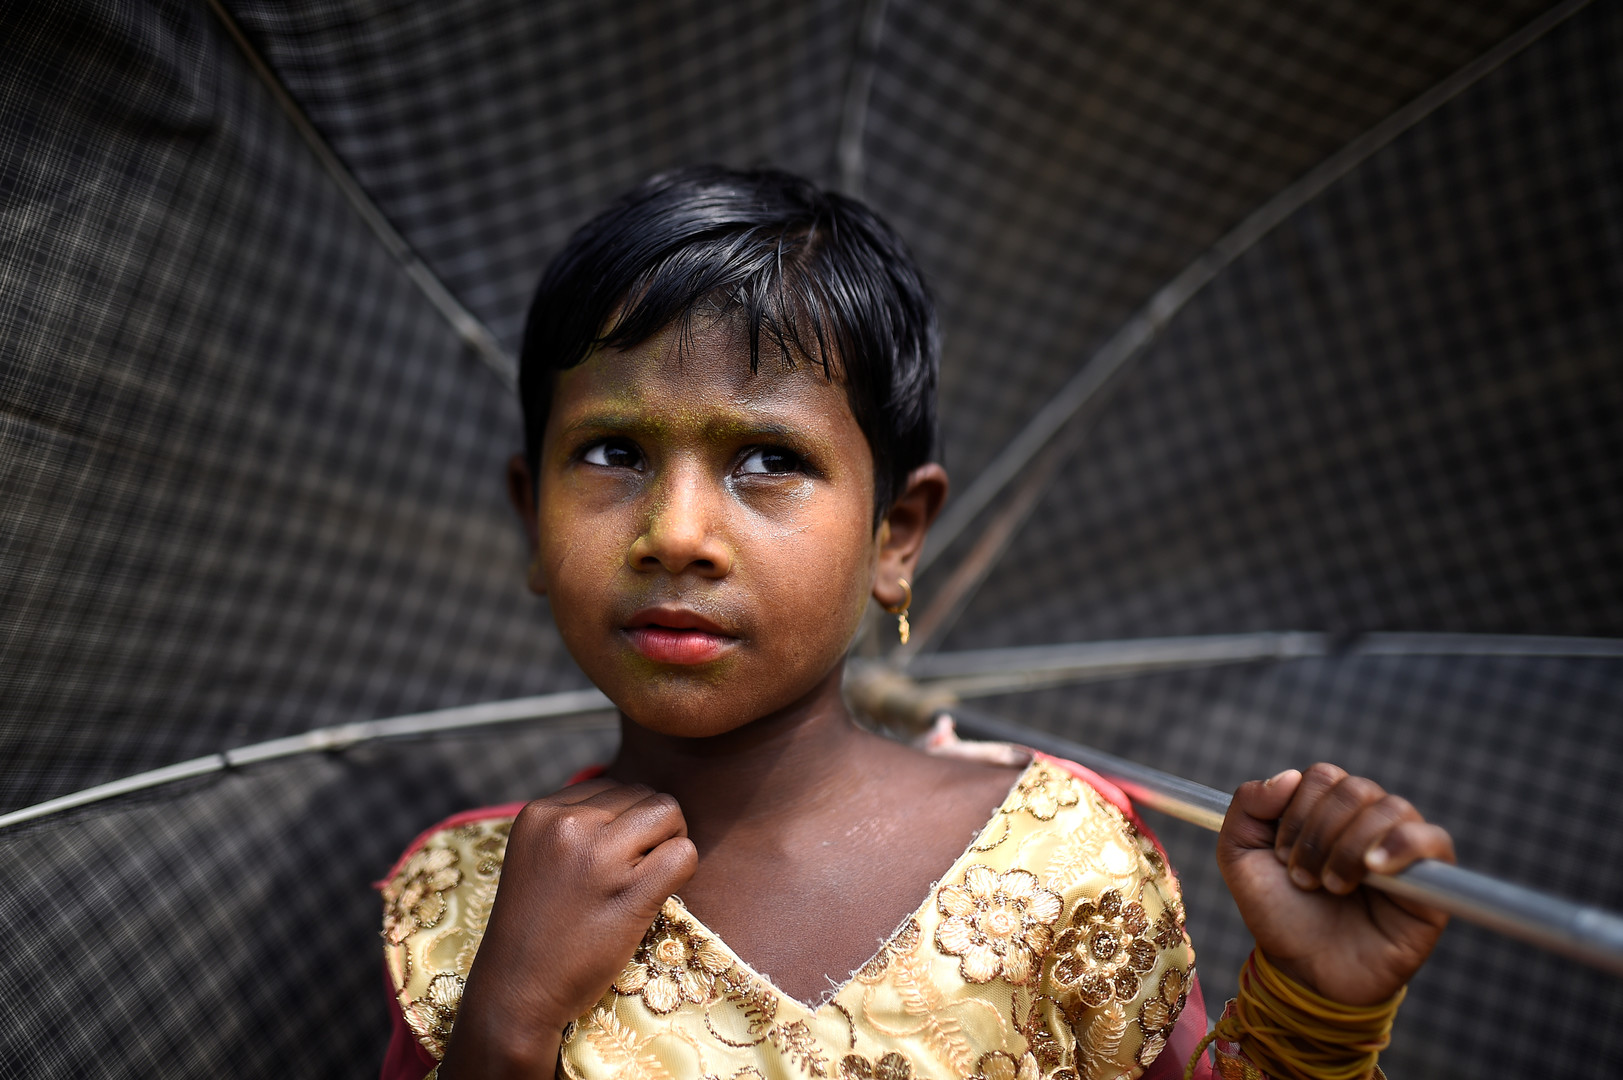 Zinu Ara, 4 Jahre alt, im Balukhali Camp, Cox Bazar, Bangladesch, 31 März 2018.